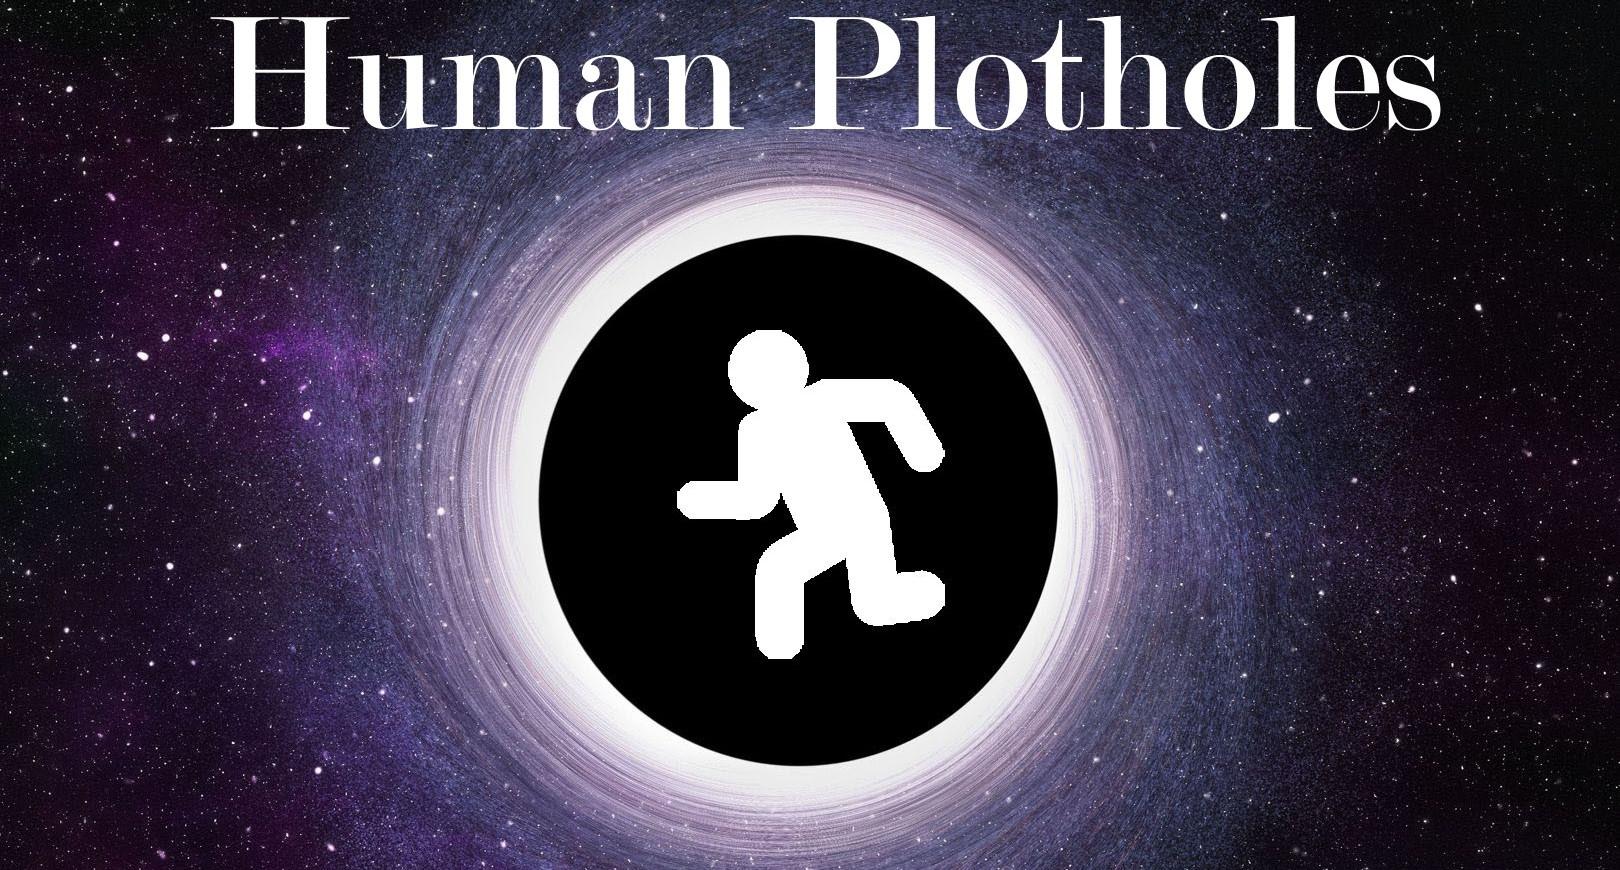 Human Plotholes